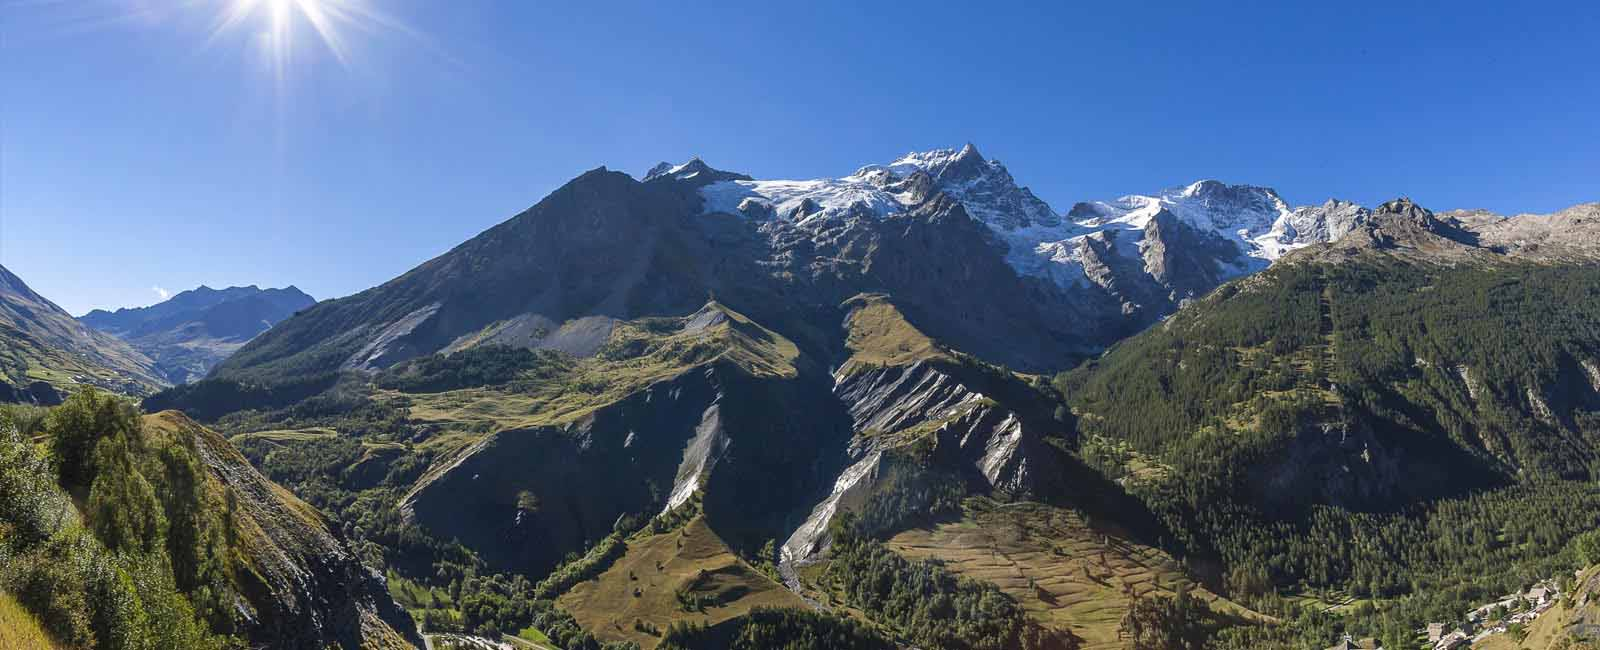 La Grave - La Meije Hautes-Alpes